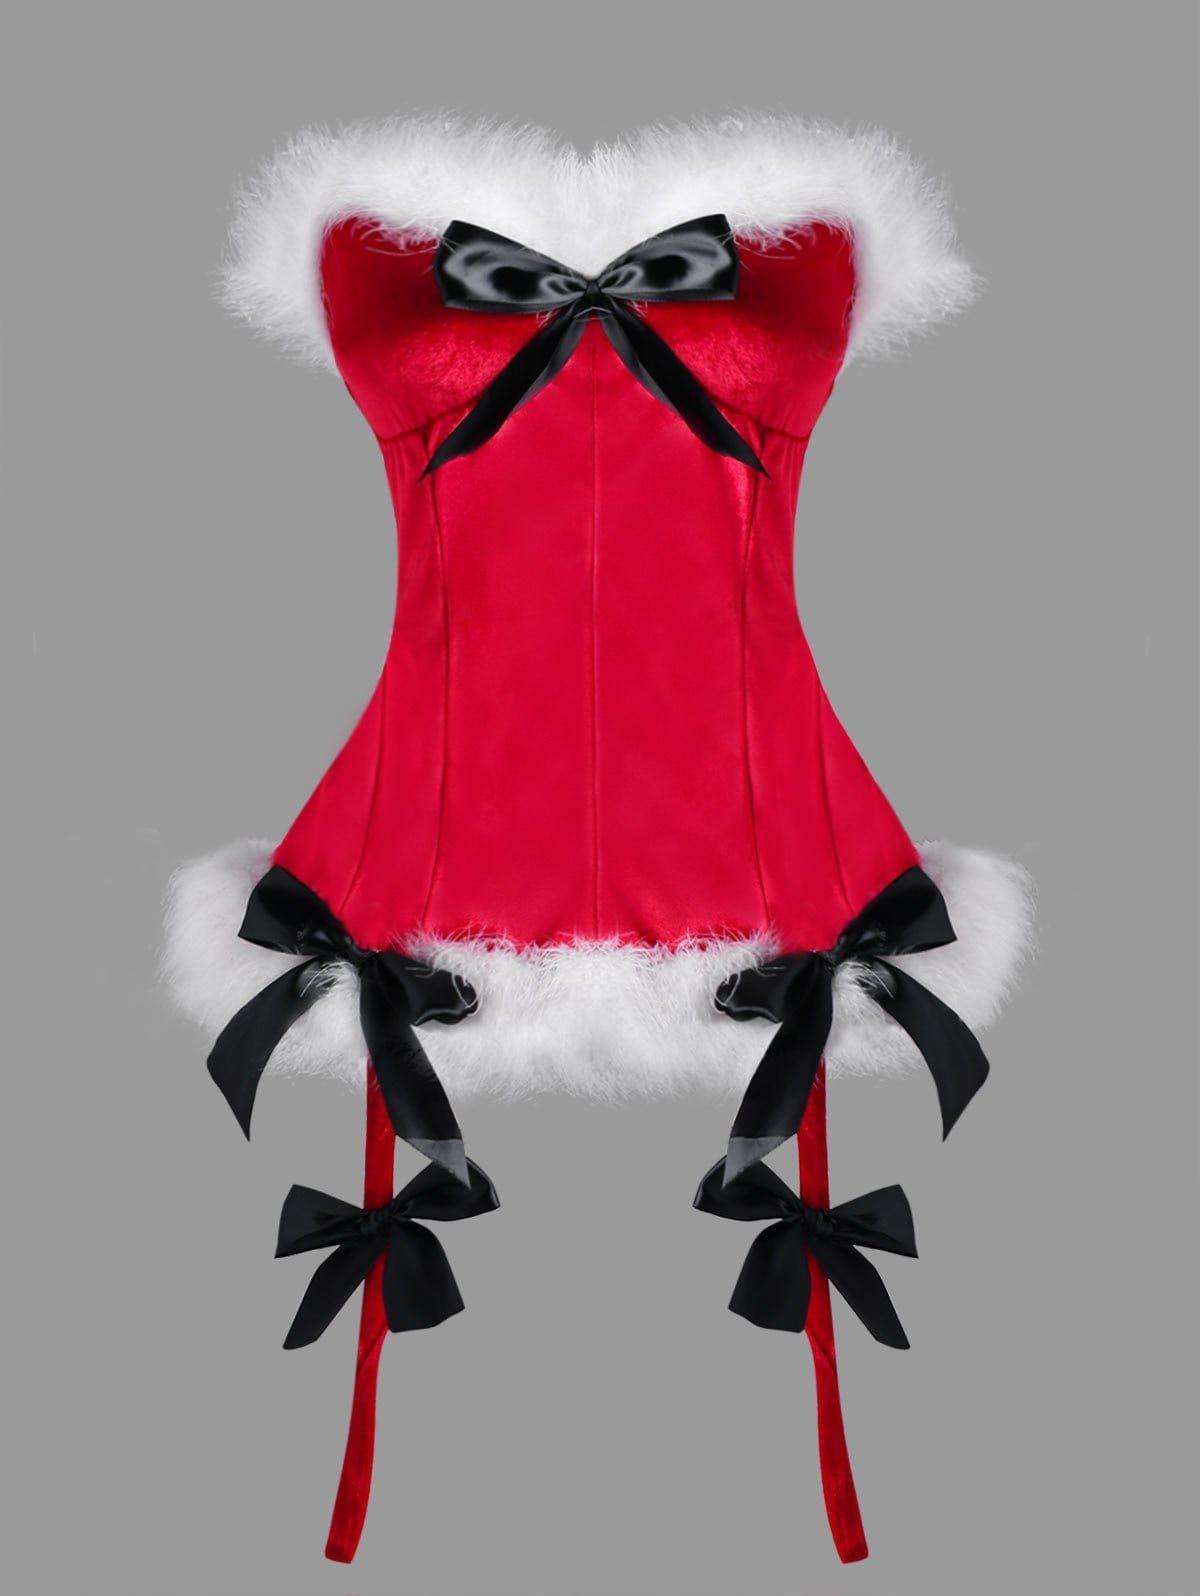 81a31d40531ef Fun idea - budoir photo session as Mrs. Claus - ML Christmas Plus Size Faux  Fur Bowknot Embellished Corset